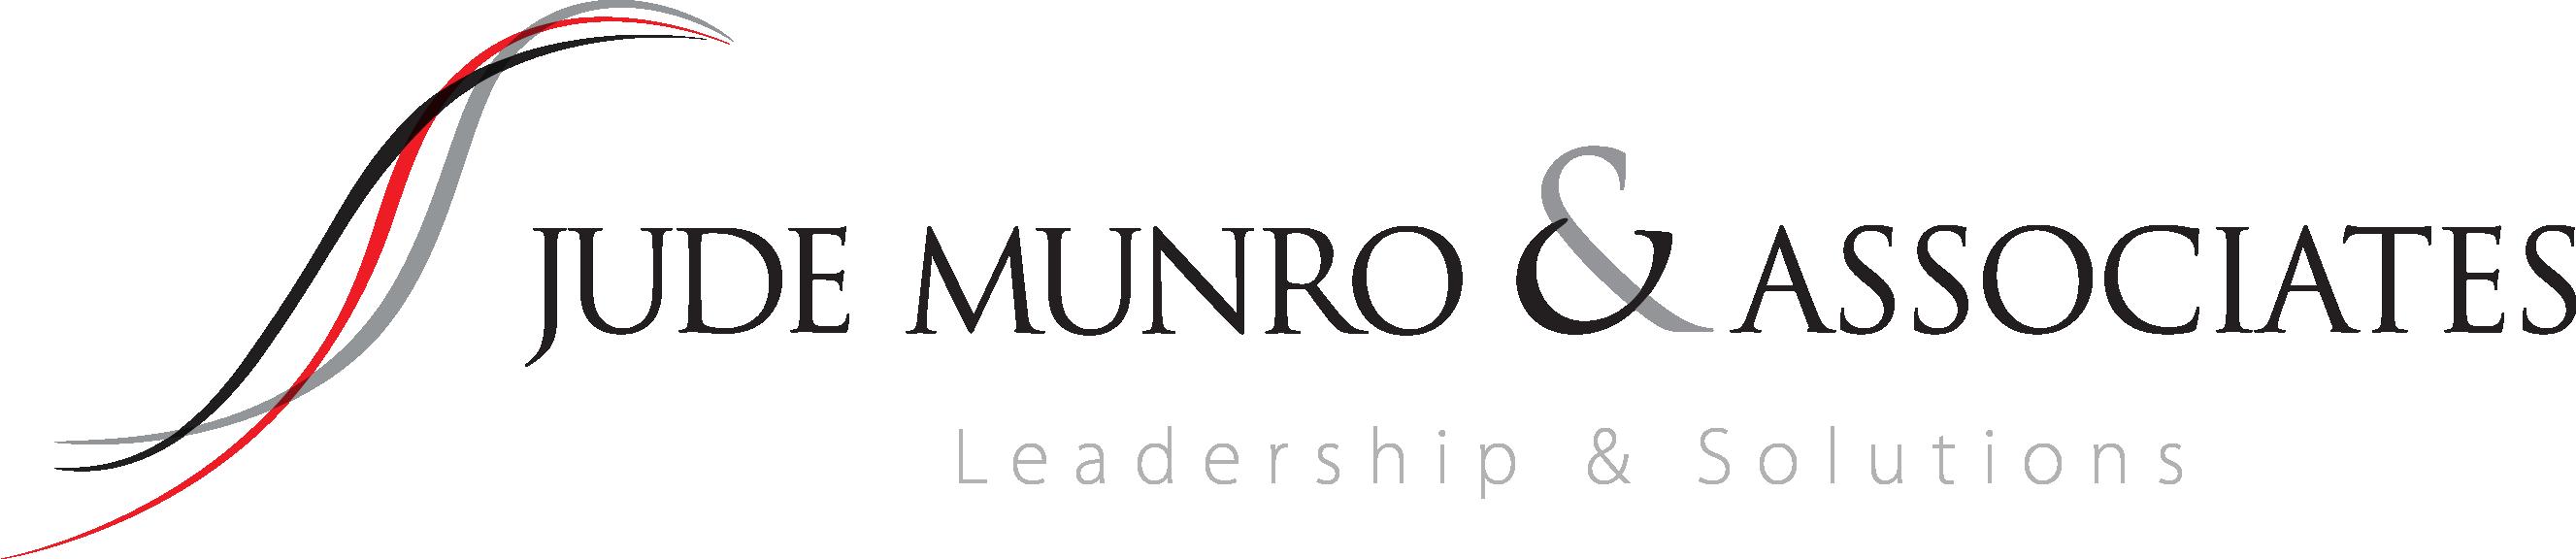 Jude Munro Associates